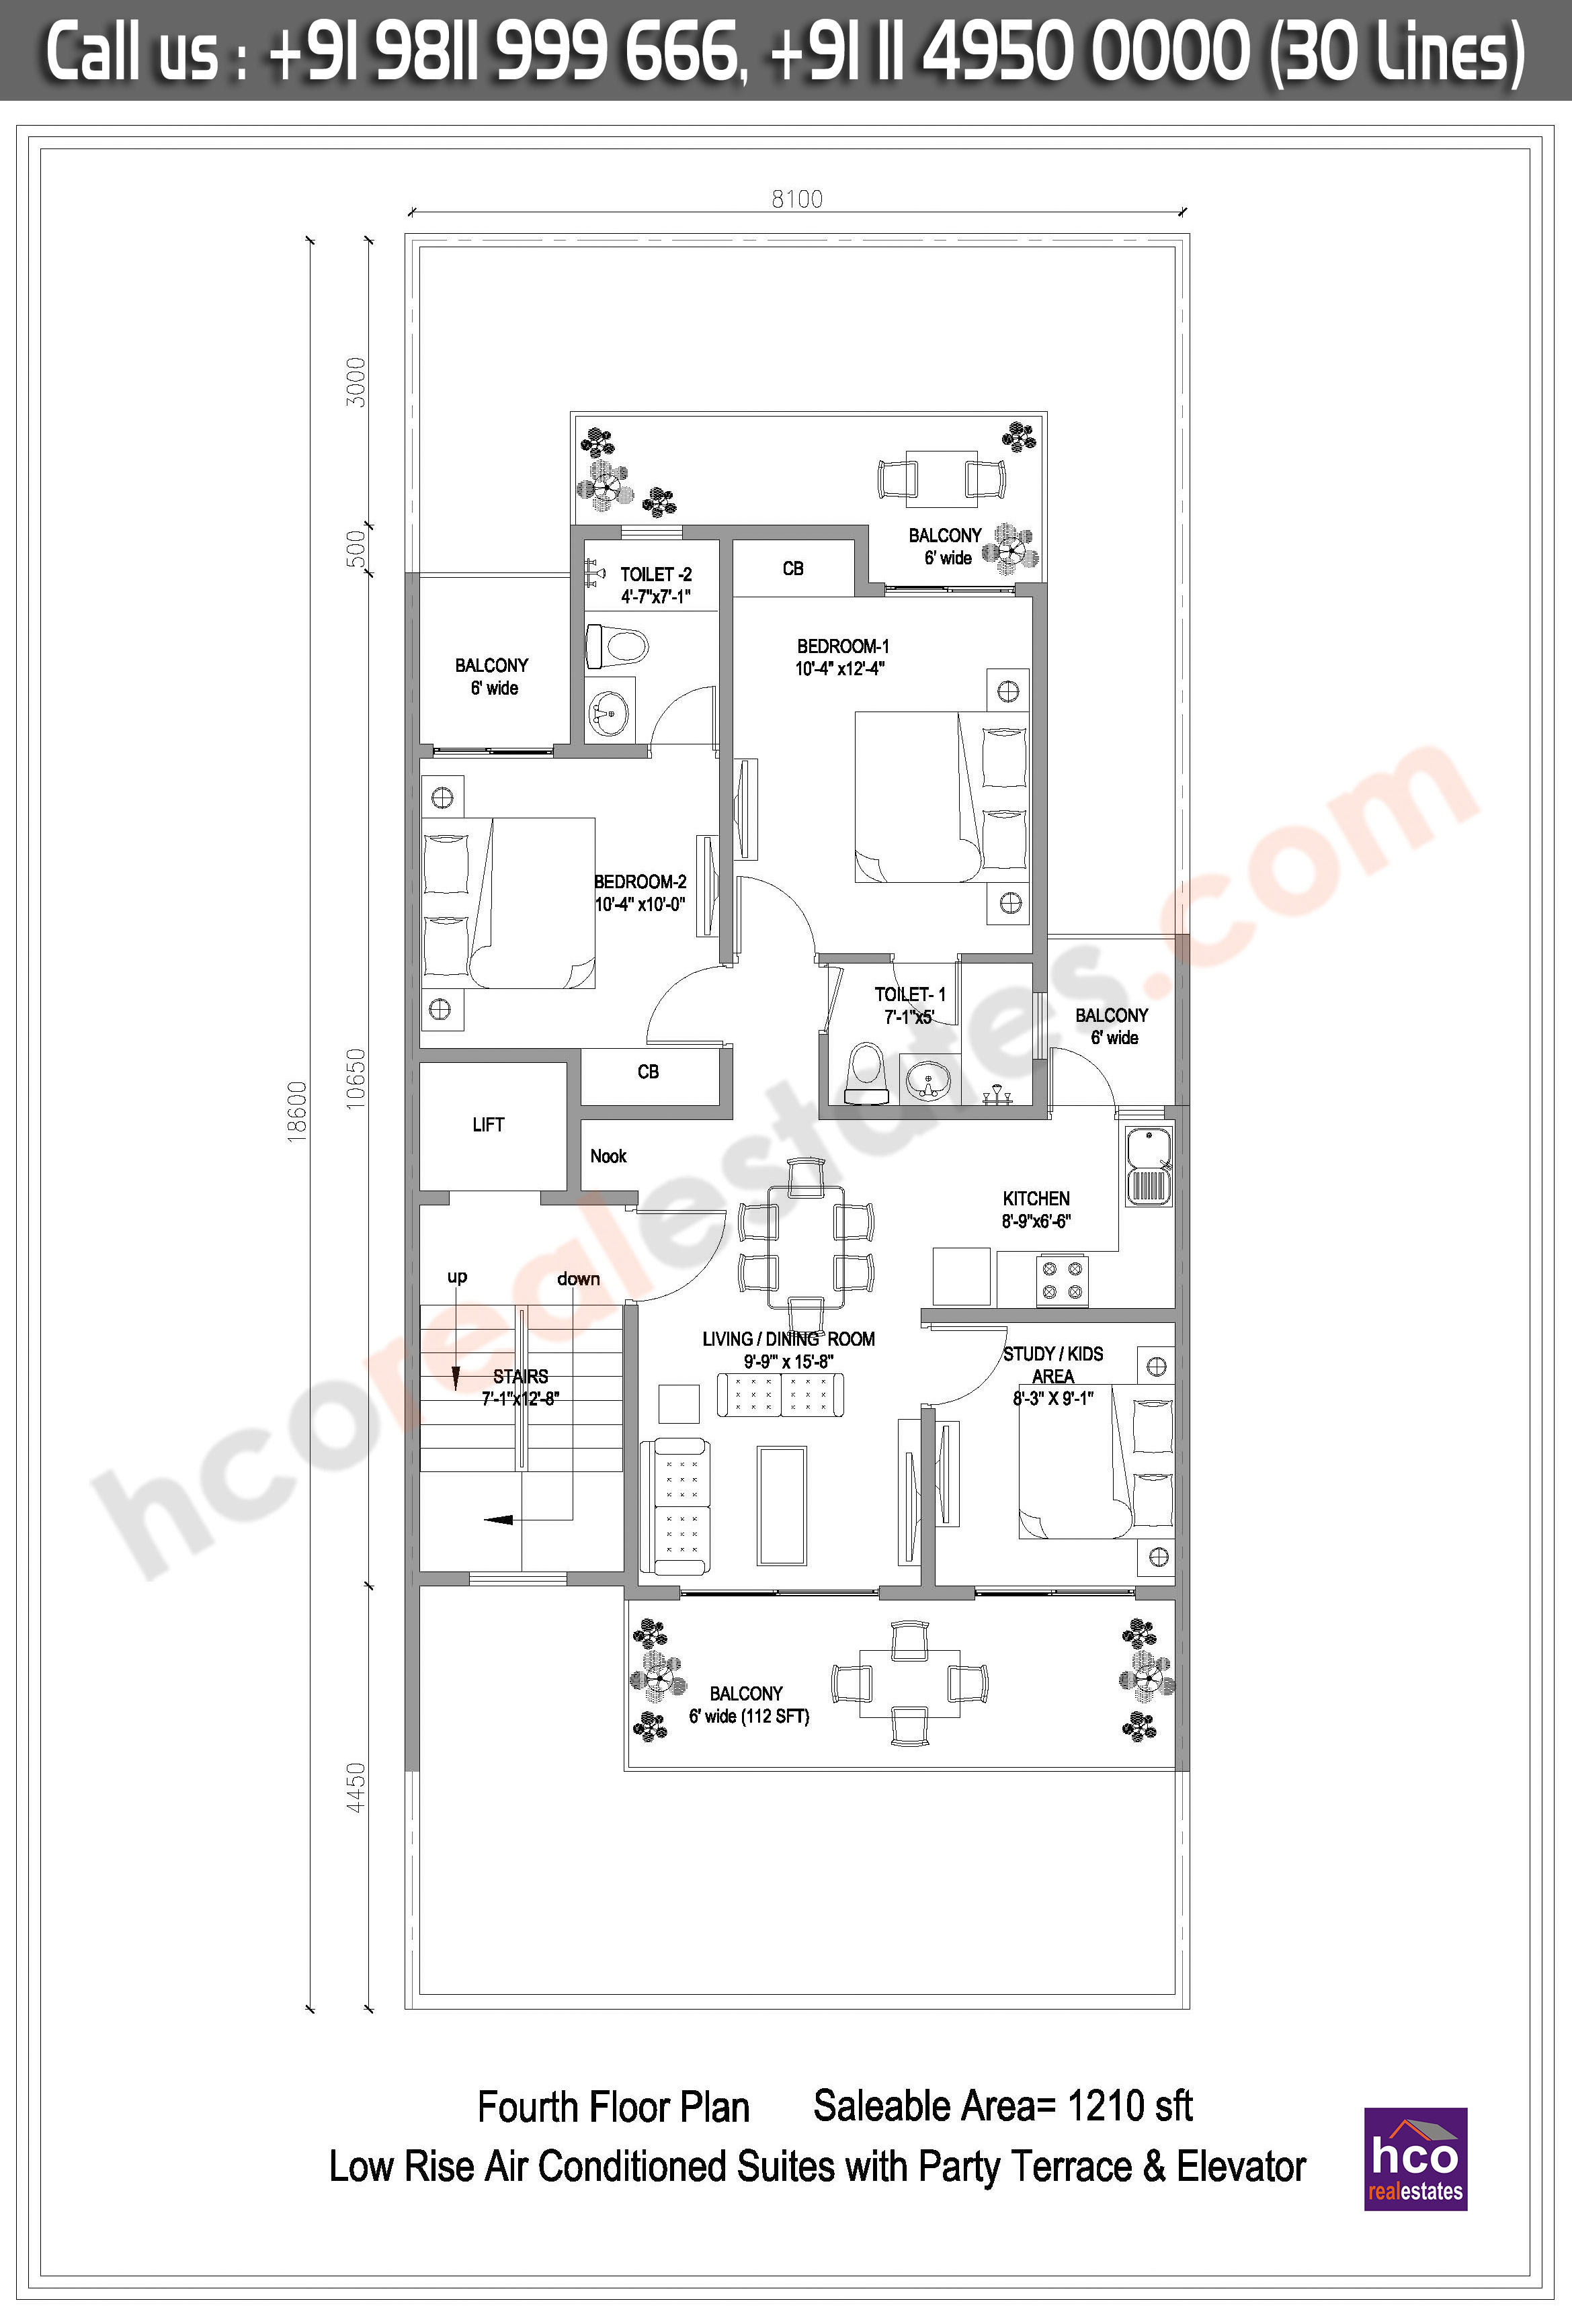 Floor Plan Of The Central Park 3 Cerise Suites Floors